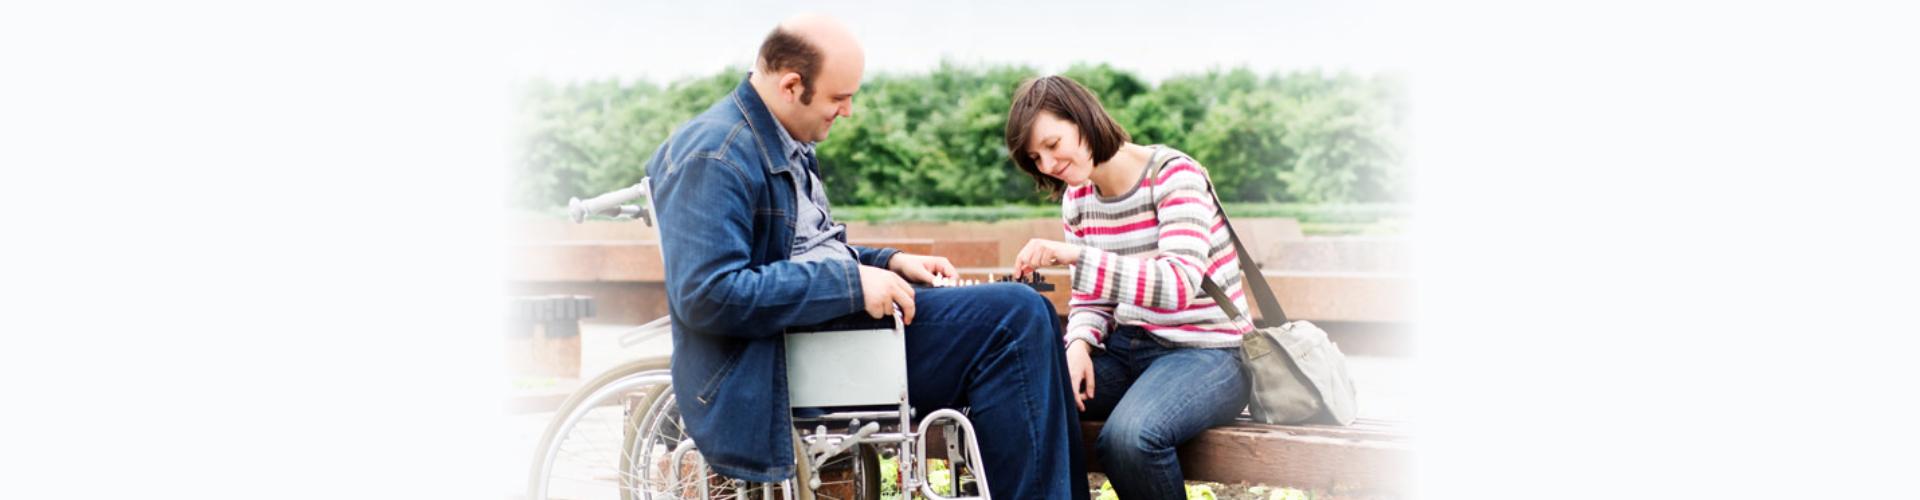 senior man in wheelchair with caregiver